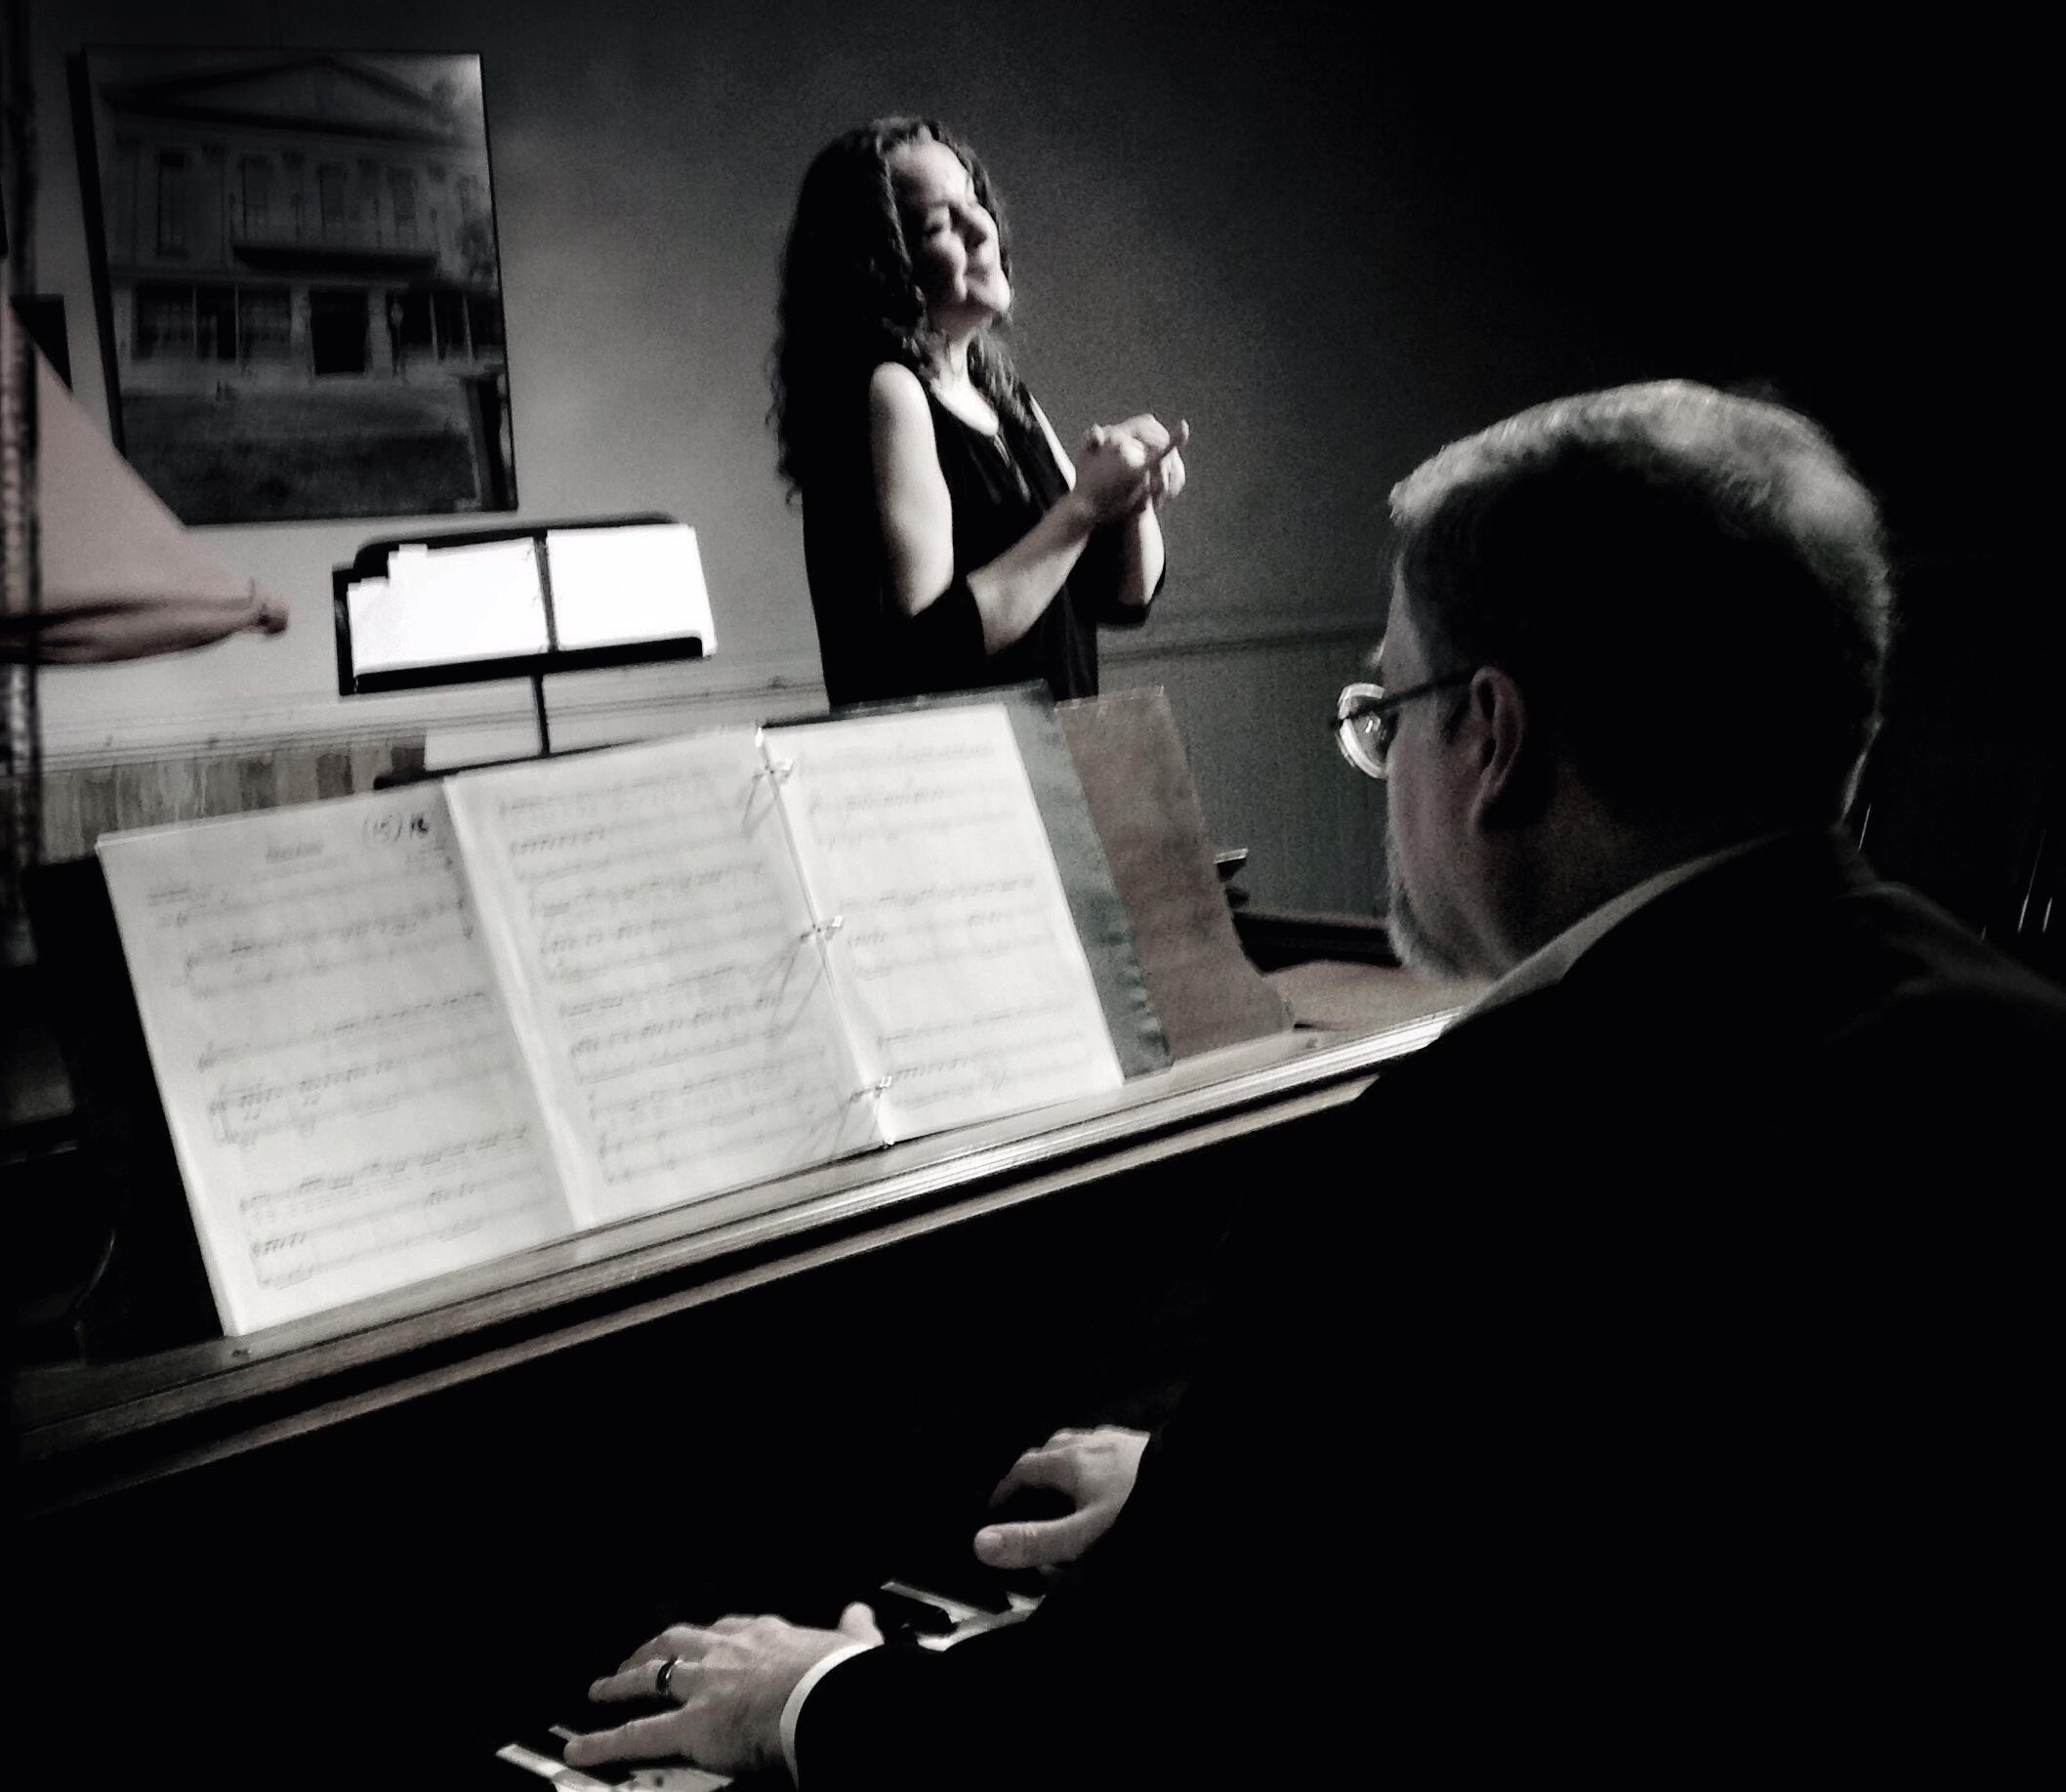 Daron Hagen accompanies Gilda Lyons at the Hudson Opera House in Hudson, NY. Spring, 2014. (Photo: Chris Lyons)